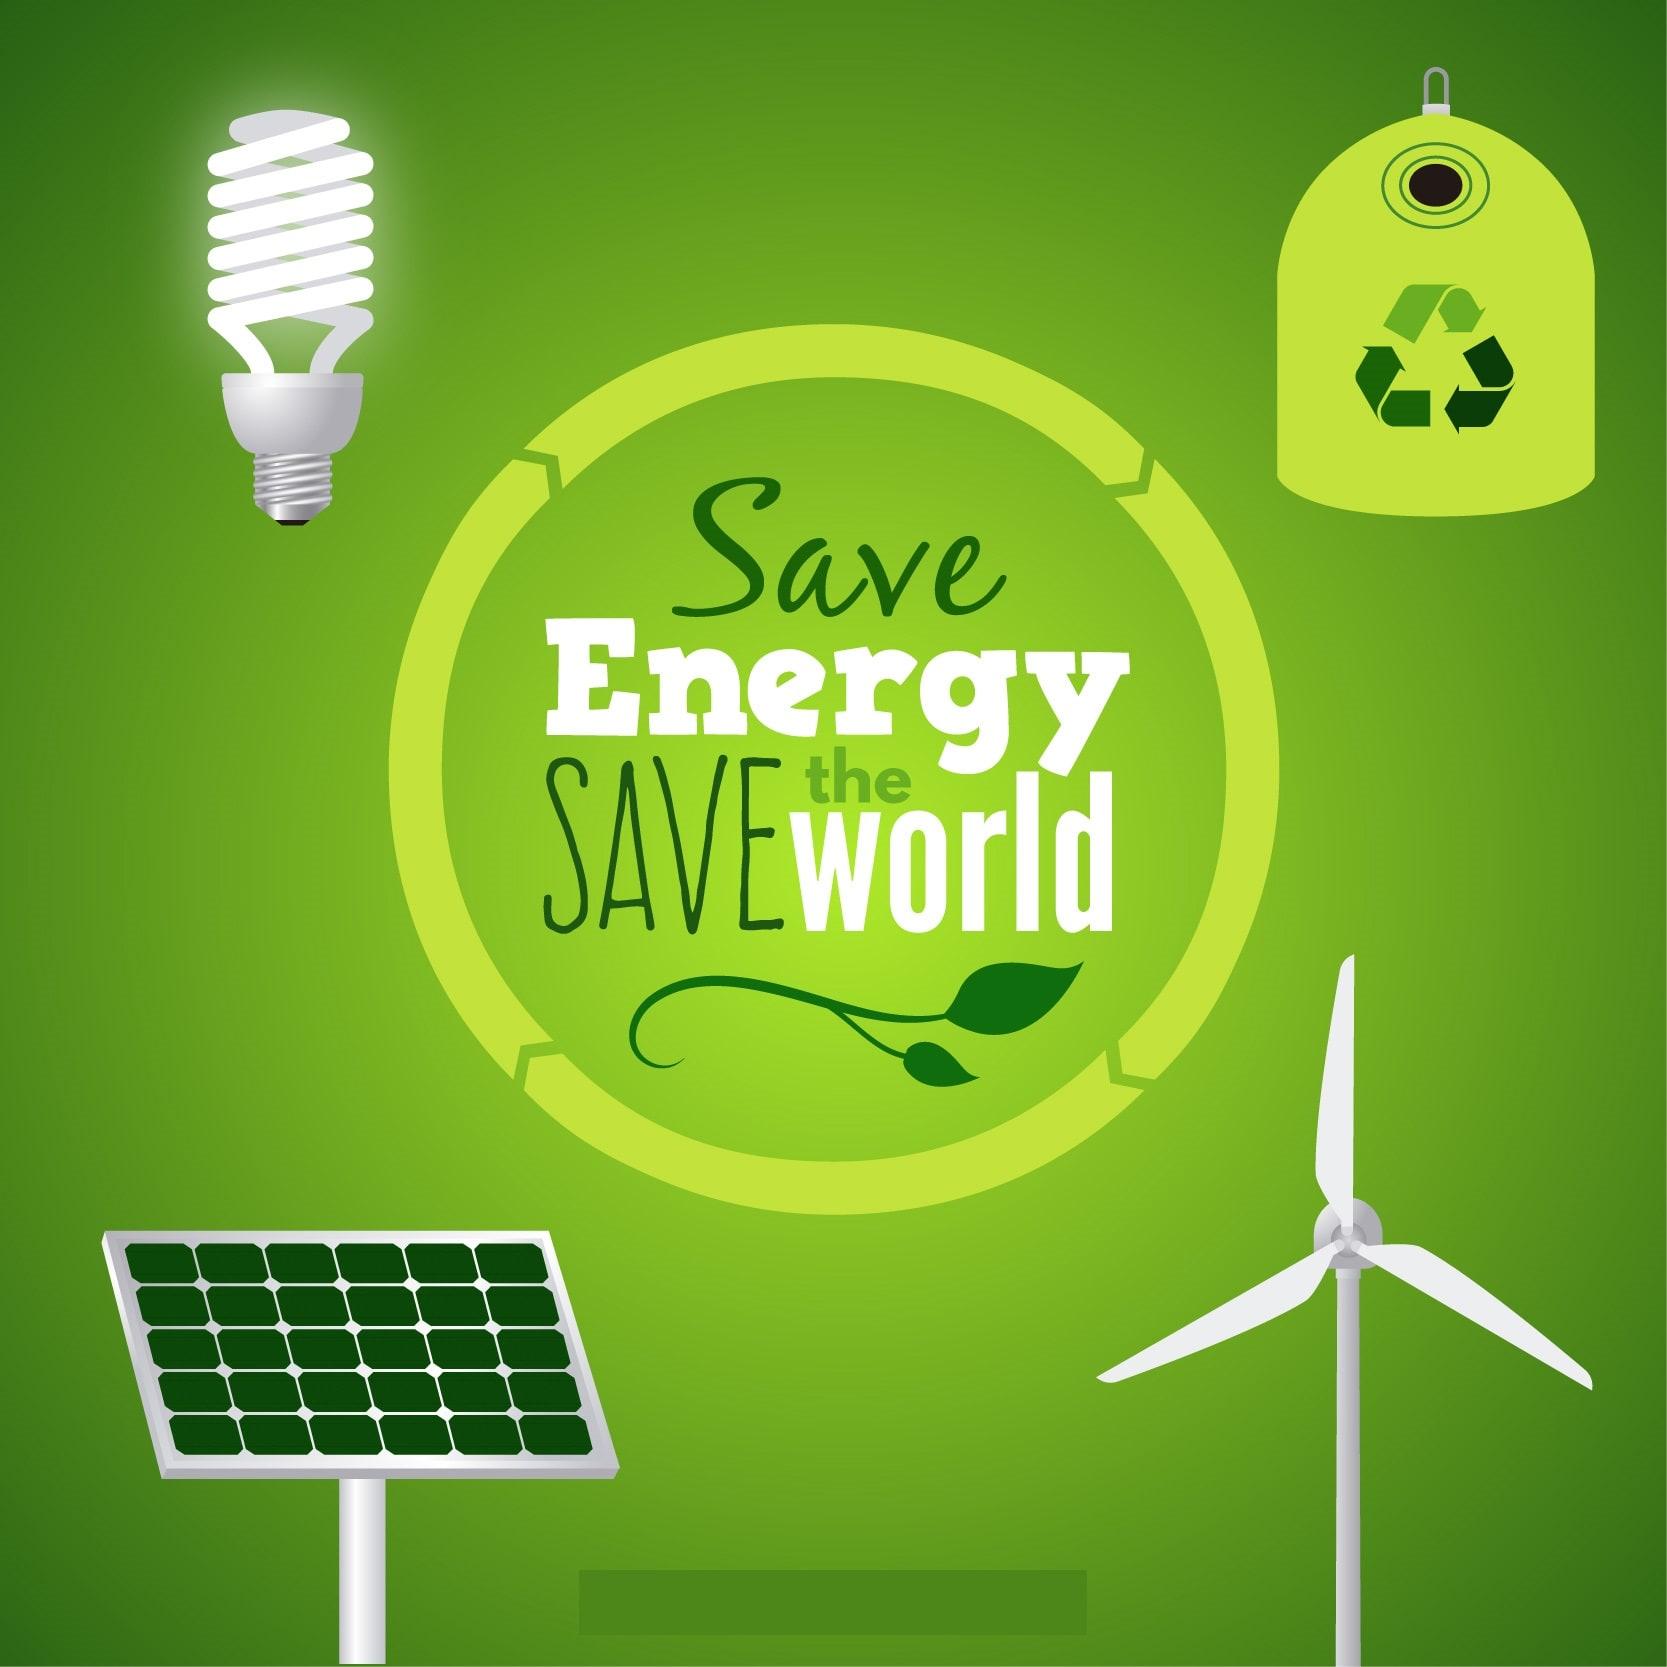 Veicoli elettrici ed Energia Rinnovabile